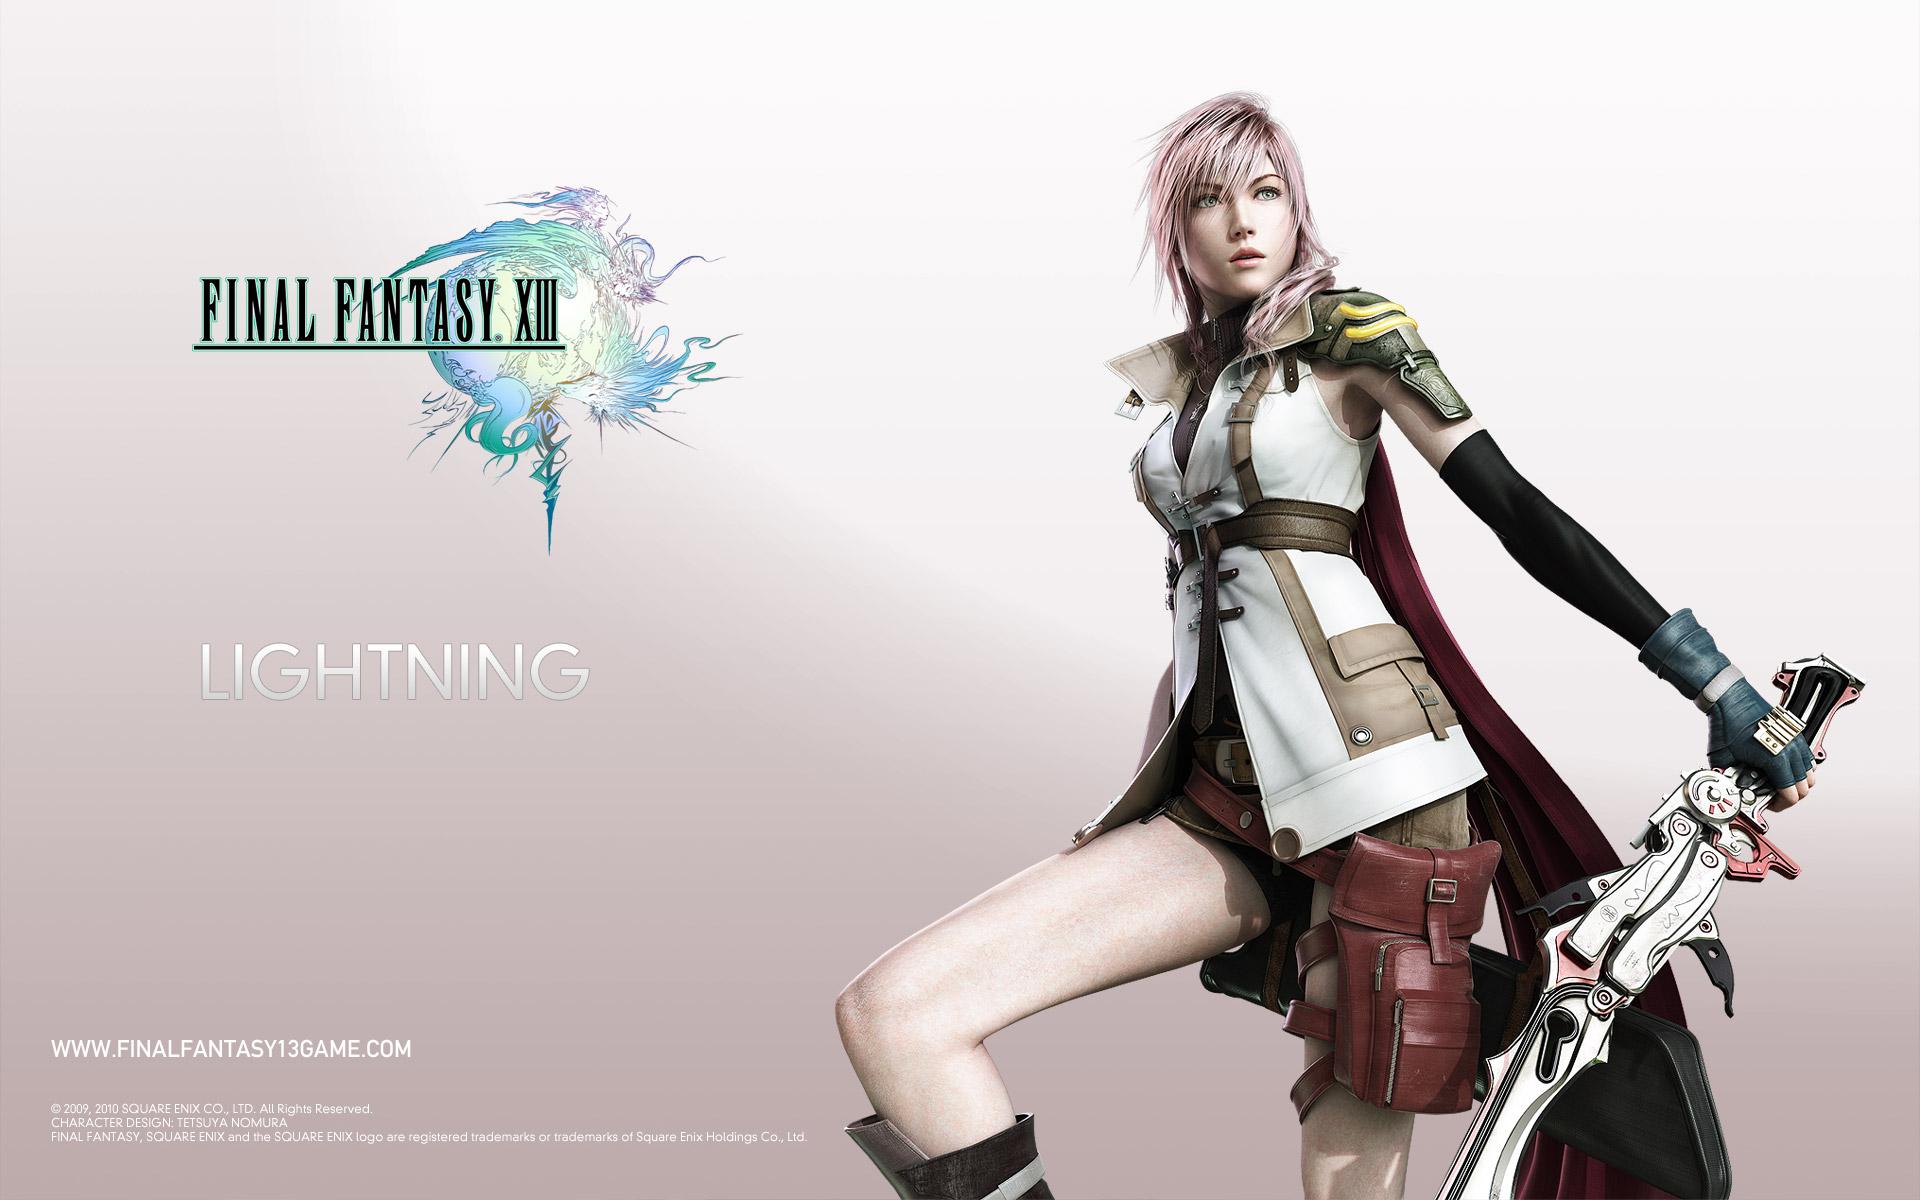 Free Download Final Fantasy Xiii Ffxiii Ff13 Wallpapers 1920x1200